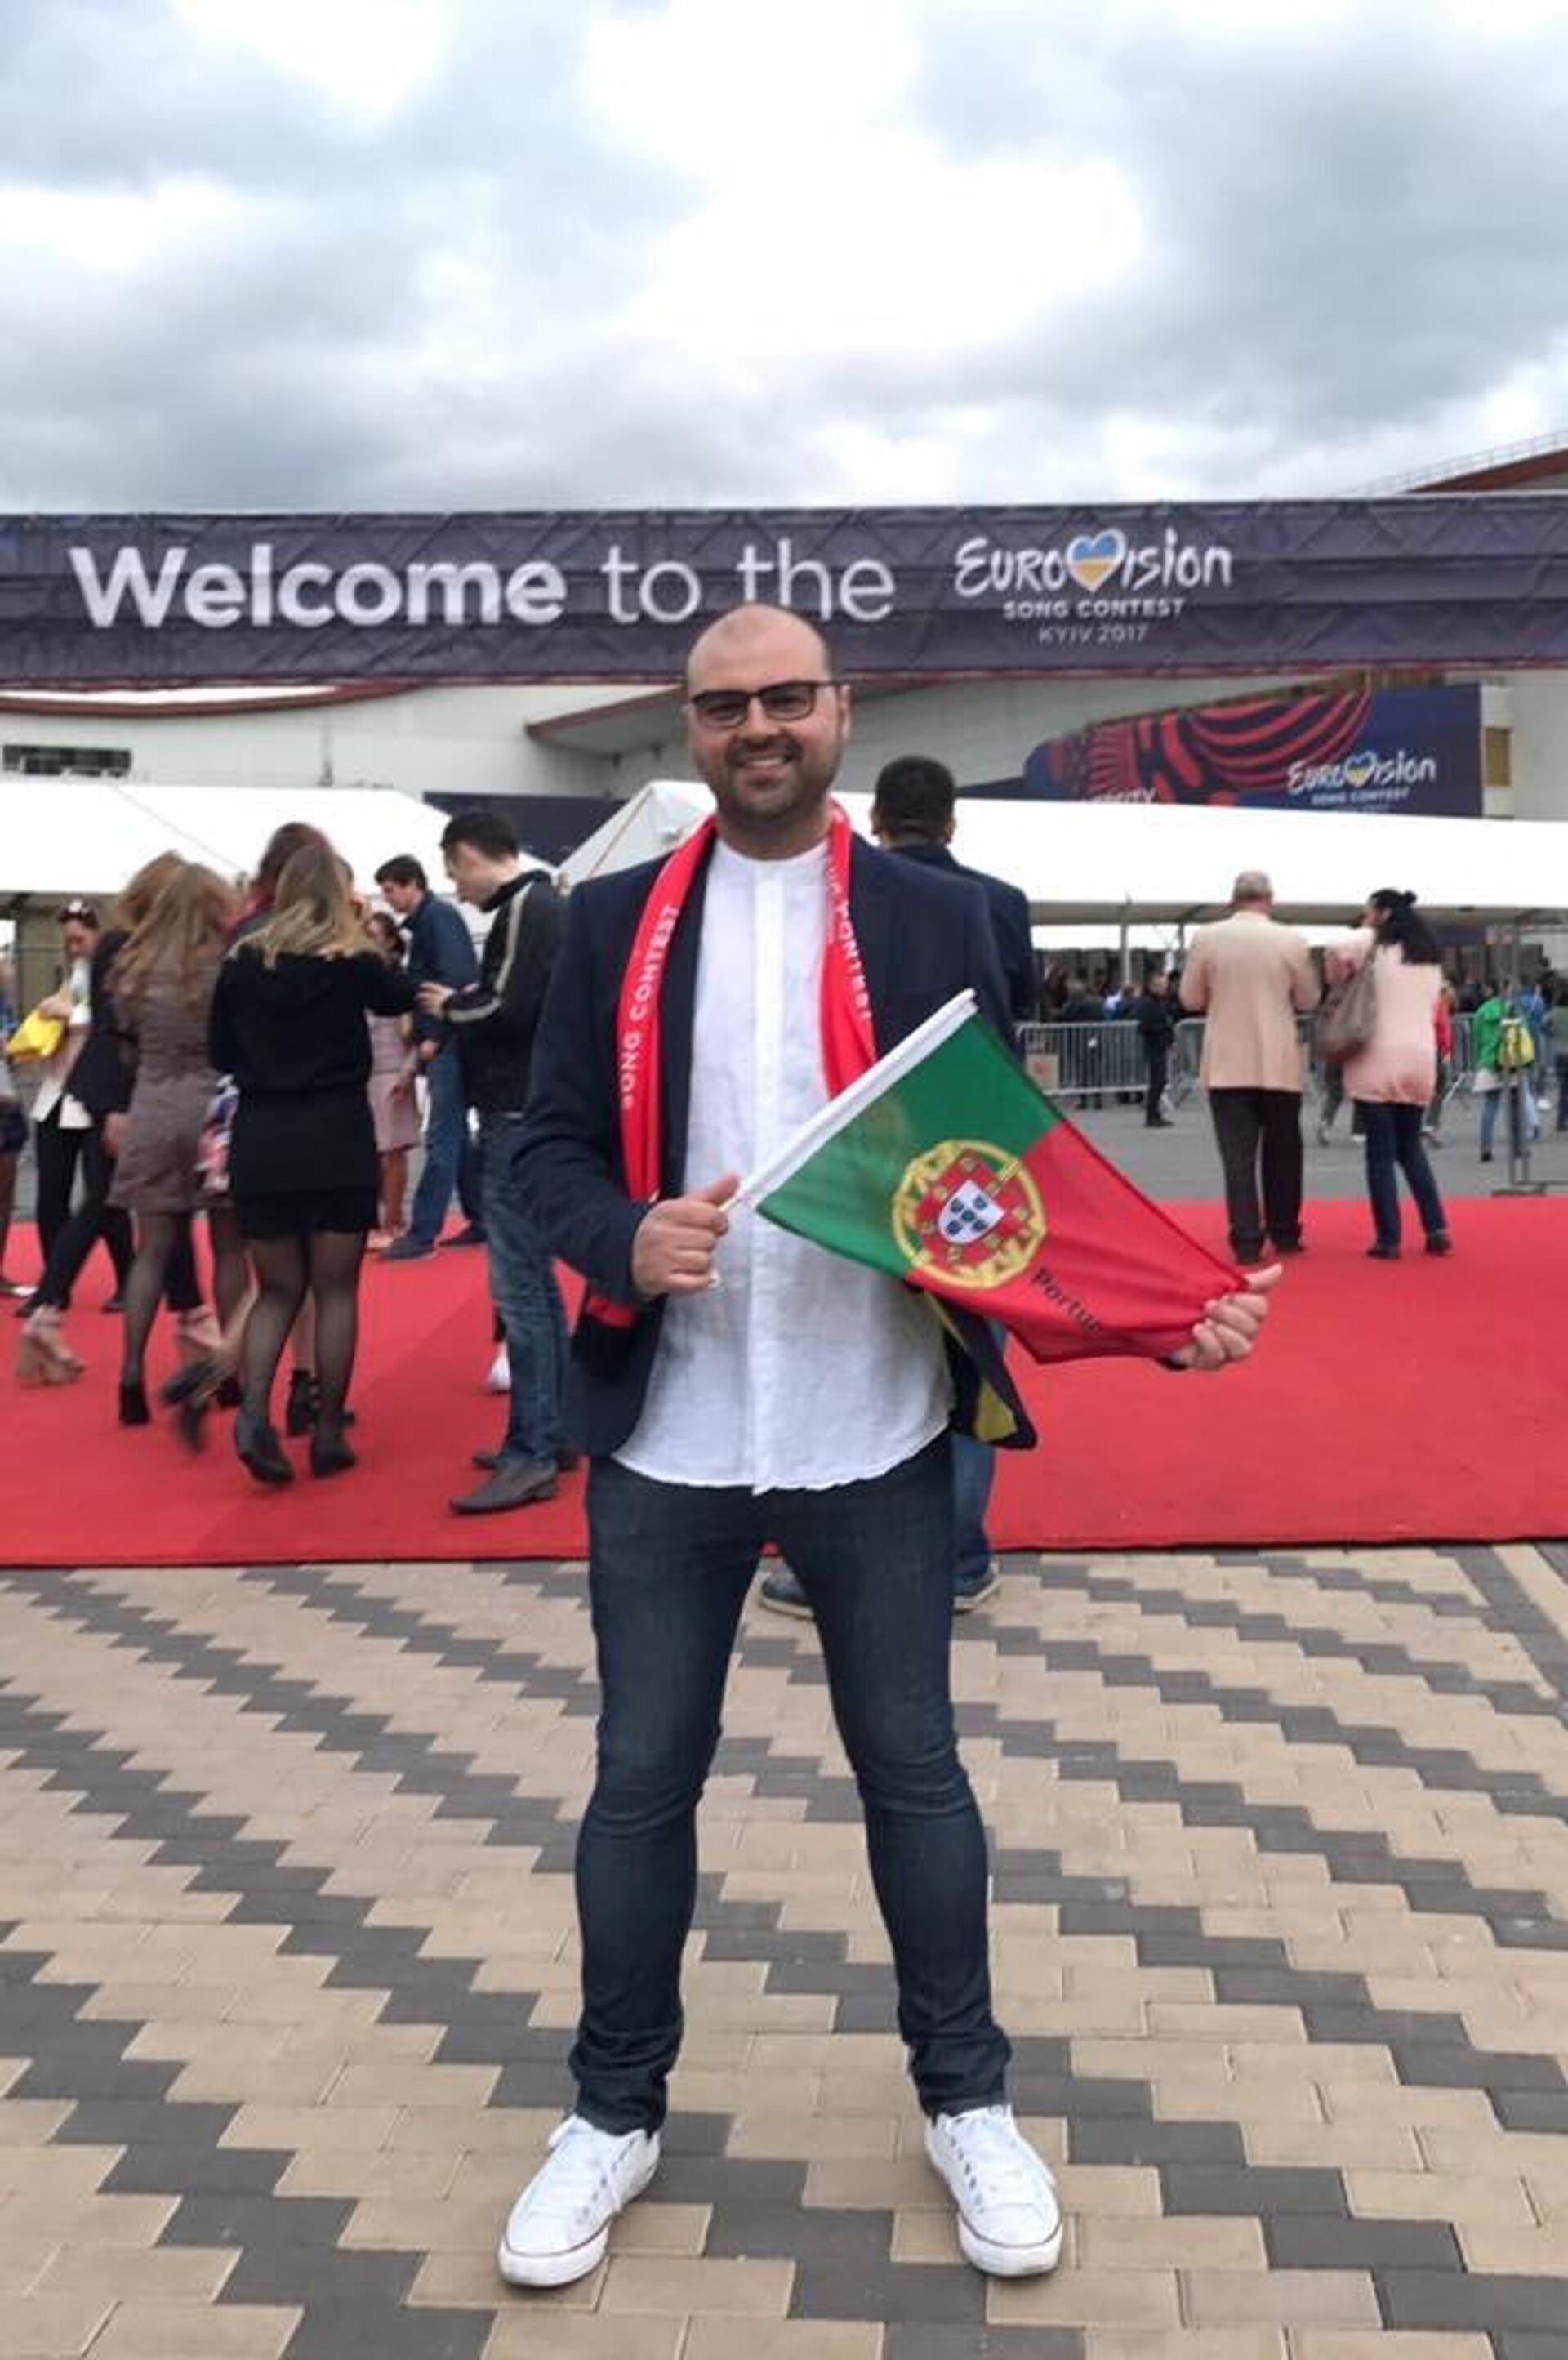 El eurofan español Iván Iñarra en el festival de Eurovisión celebrado en Kiev en 2017 - Sputnik Mundo, 1920, 21.05.2021